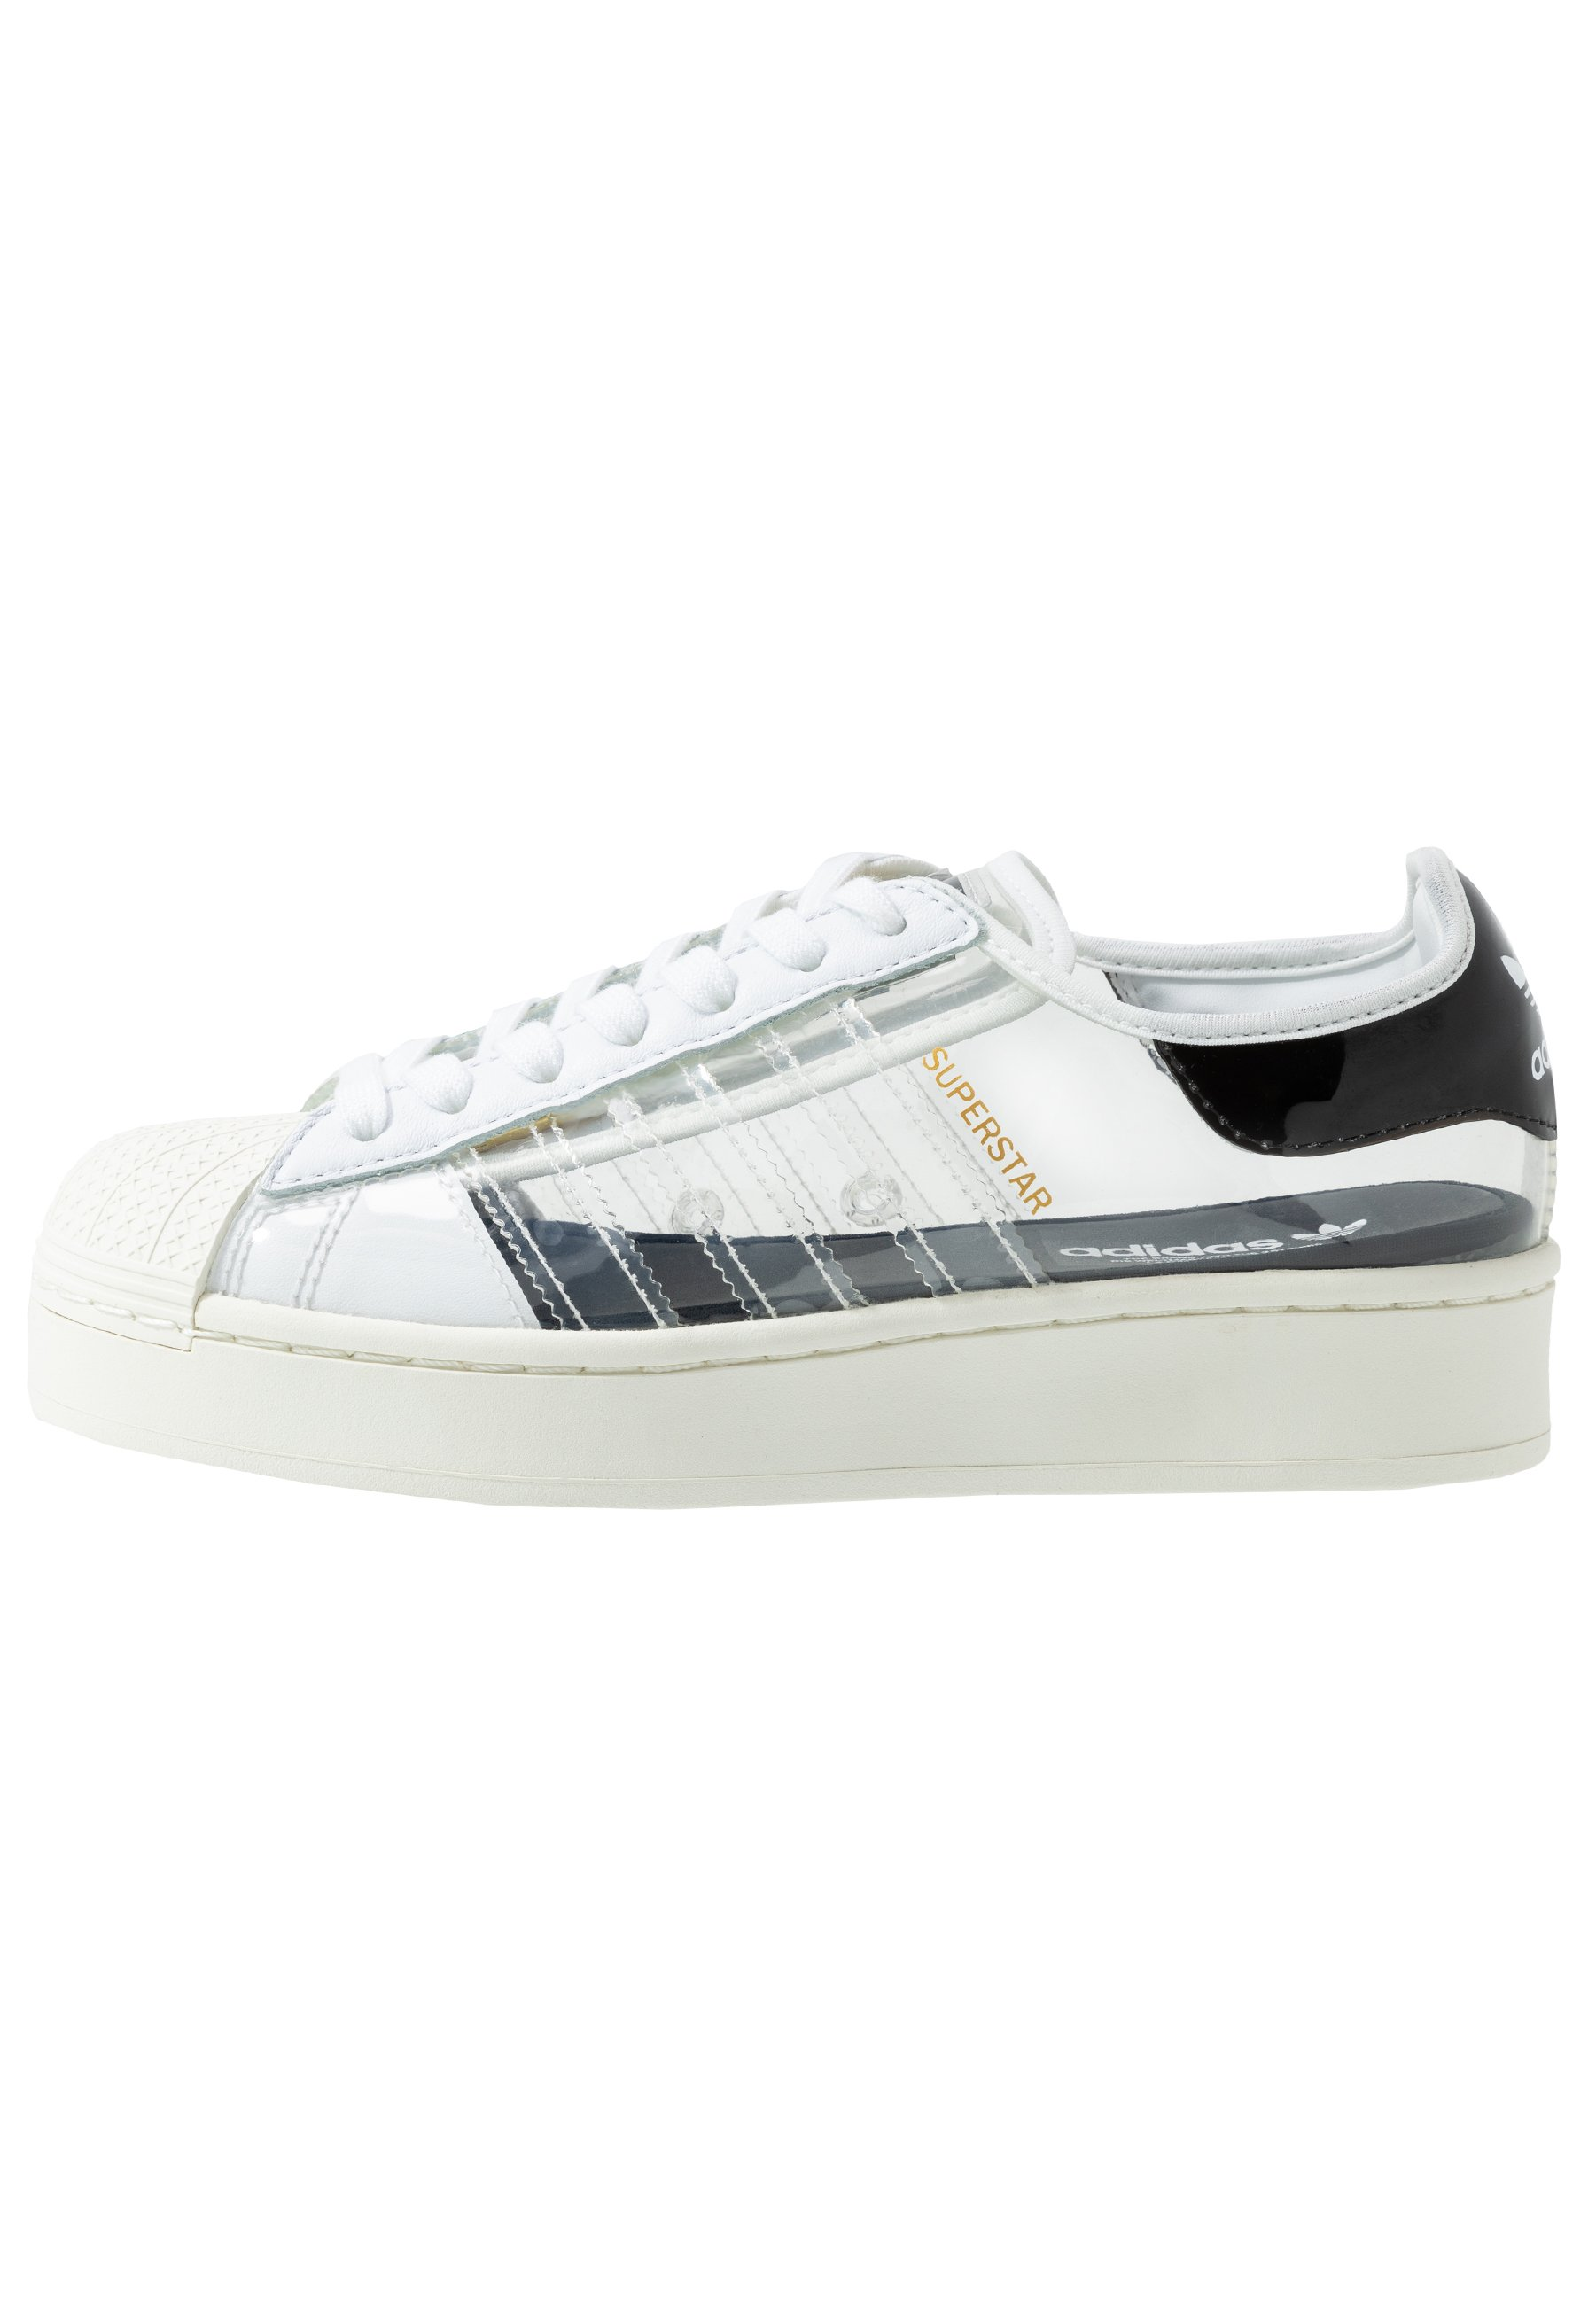 adidas Originals SUPERSTAR BOLD Sneaker low footwear